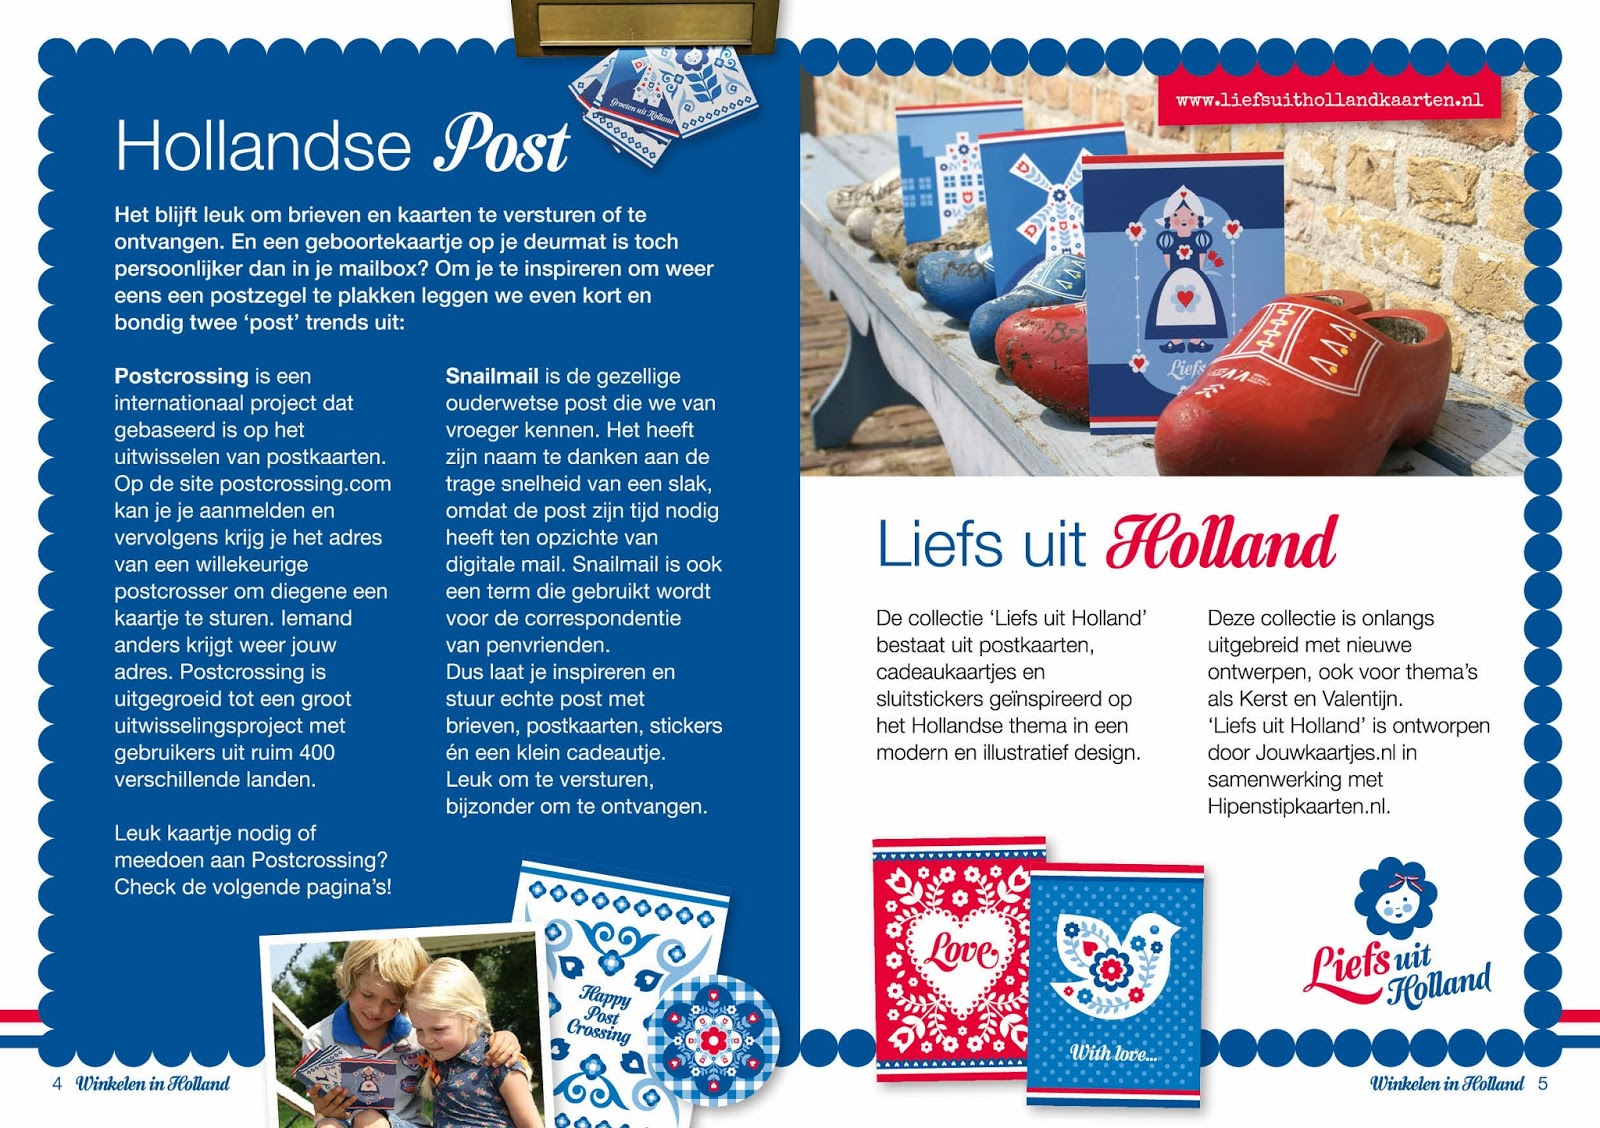 liefst uit holland